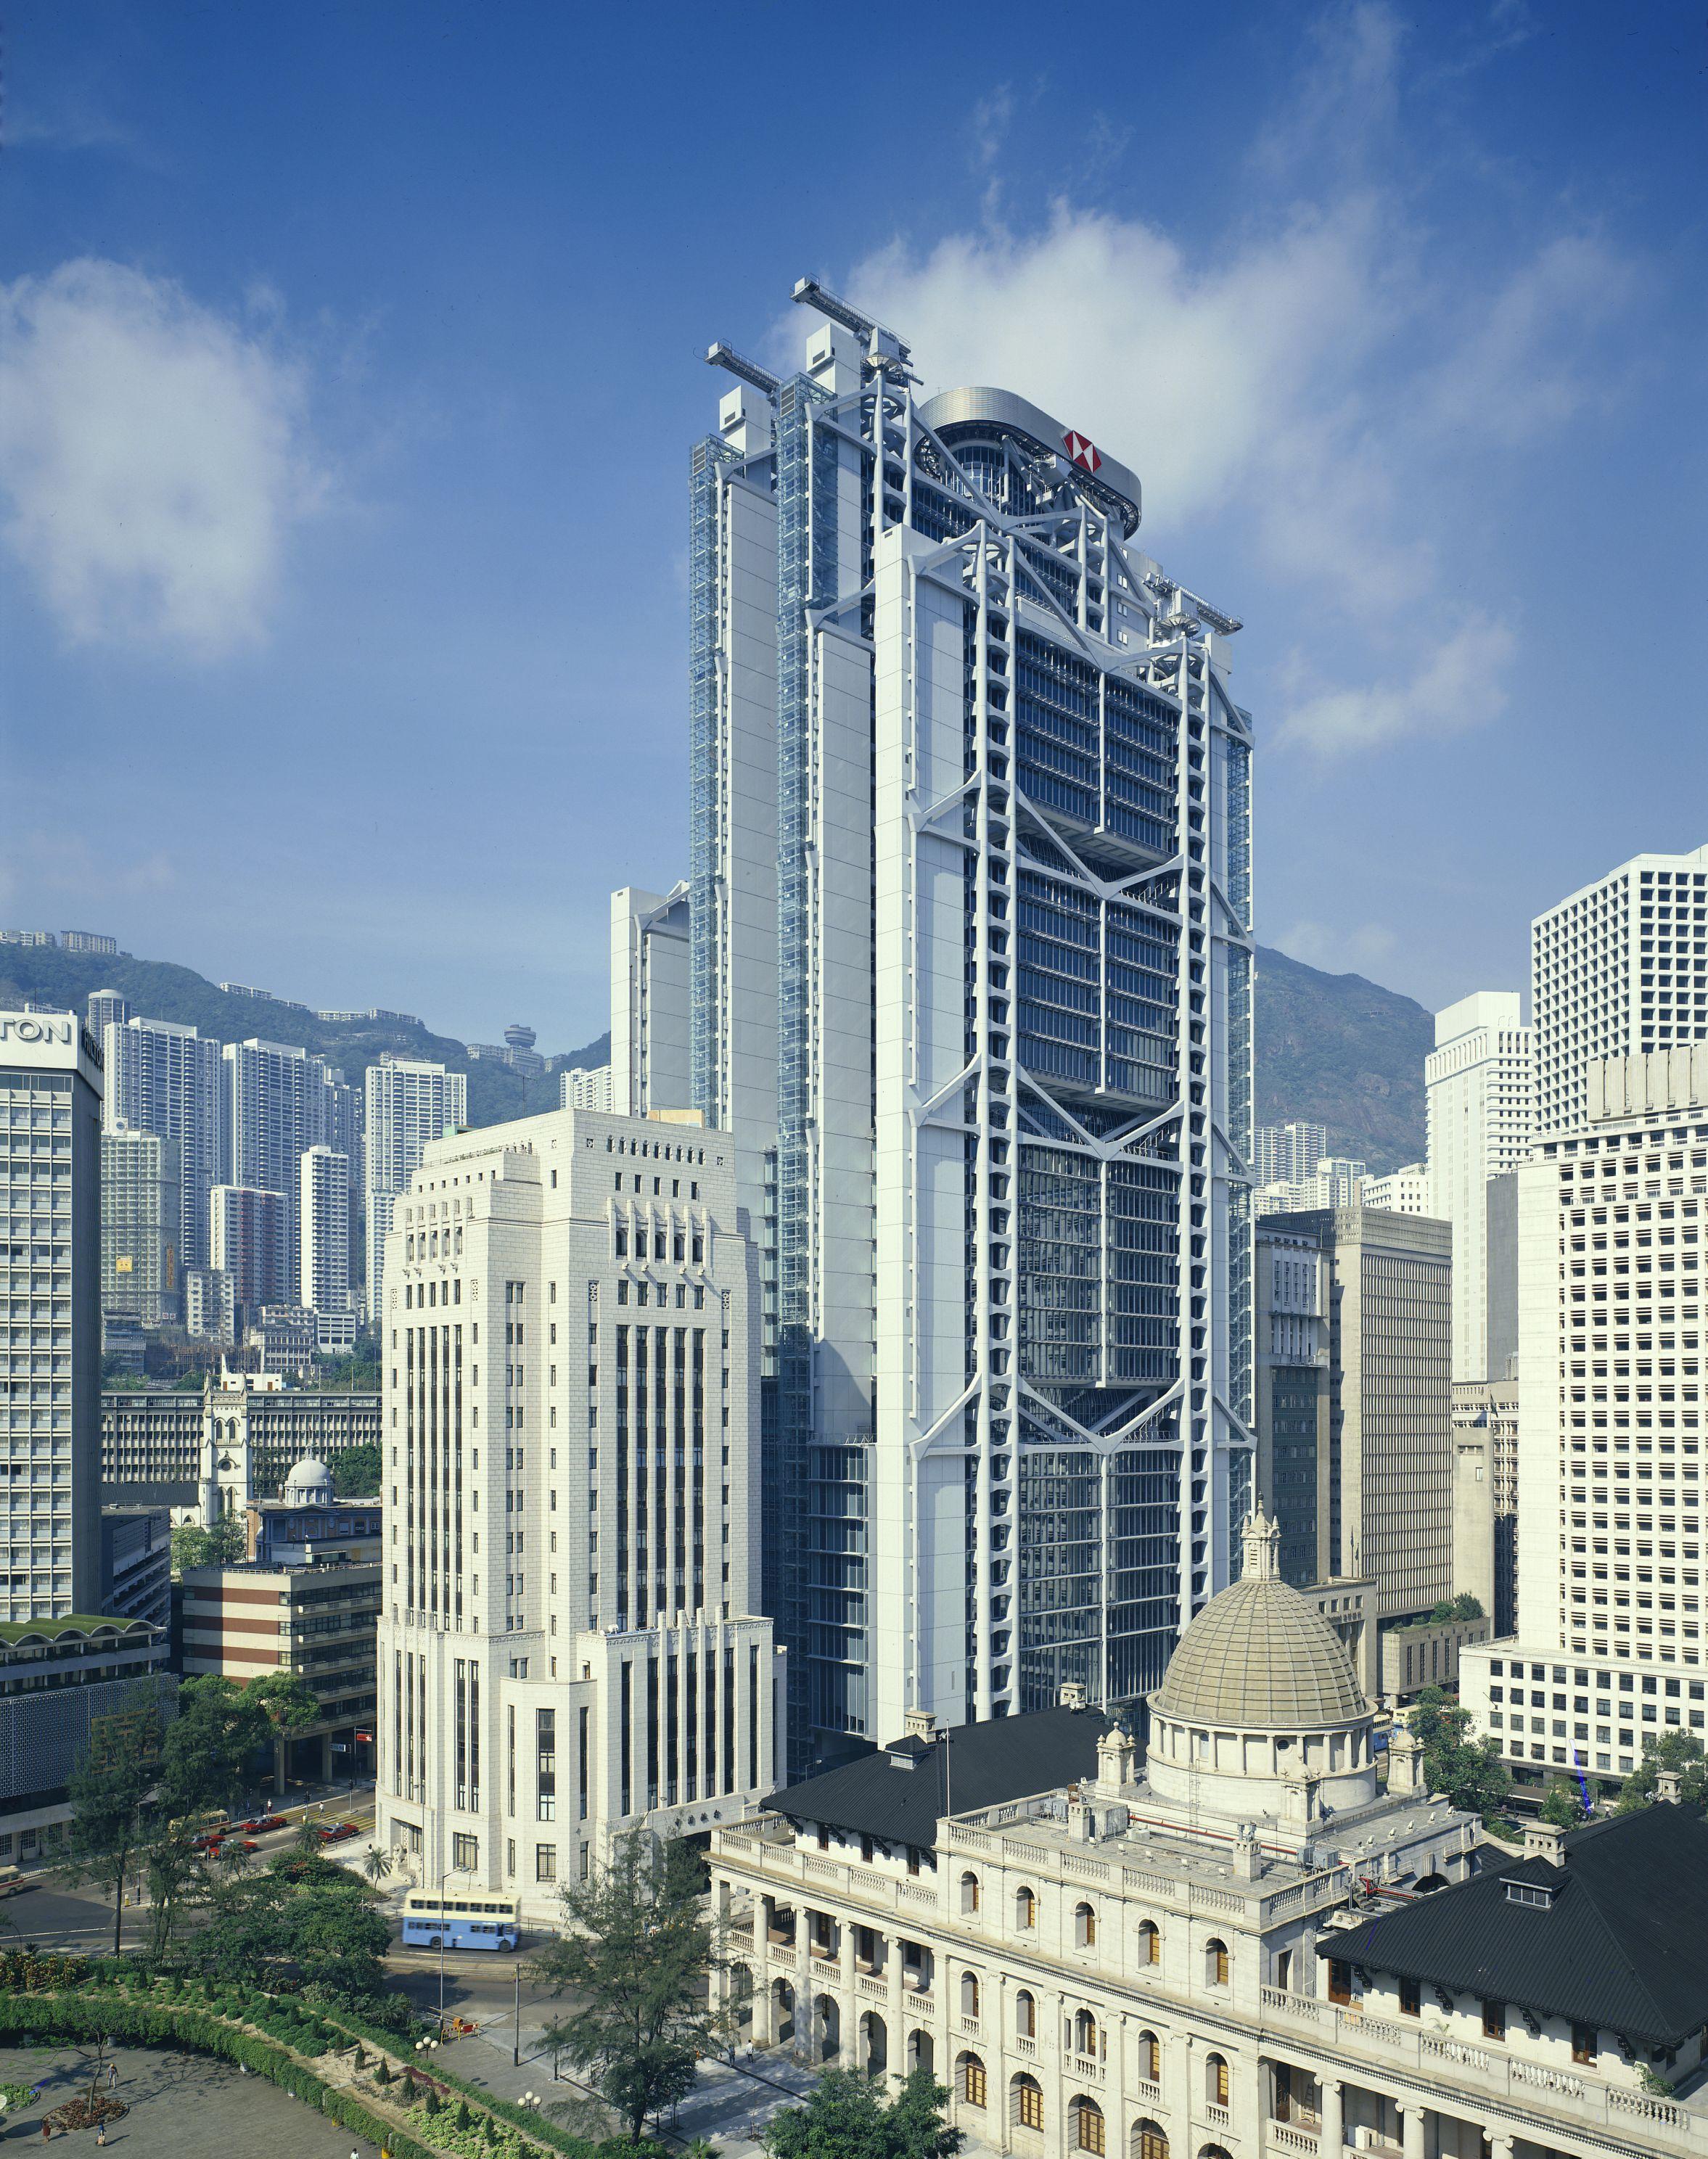 HSBC Building Hong Kong, designed by Norman Foster | Hong